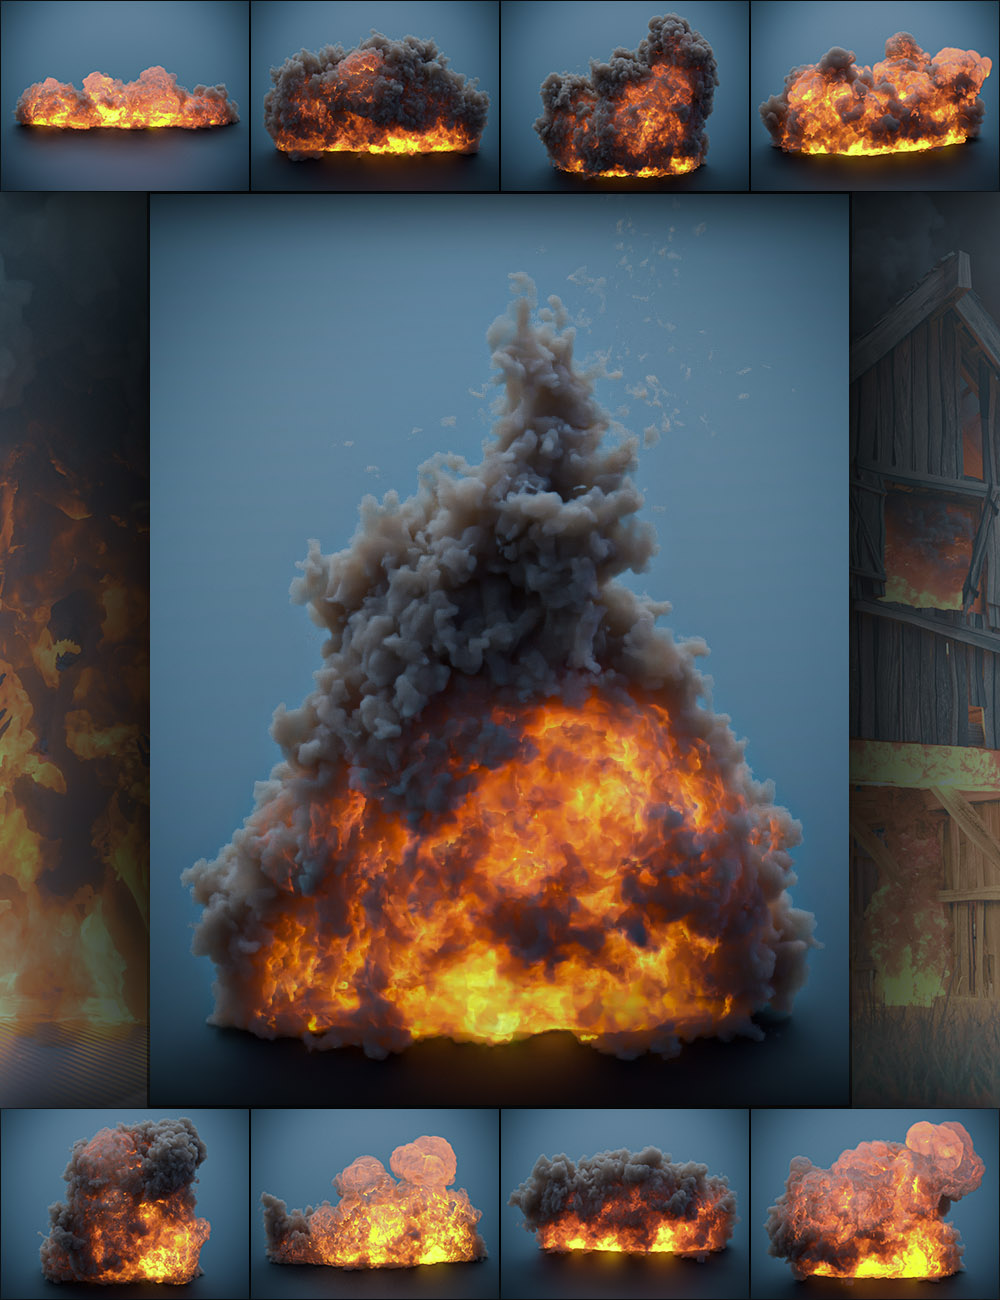 Pyromantix - Volumetric Flames by: DimensionTheory, 3D Models by Daz 3D